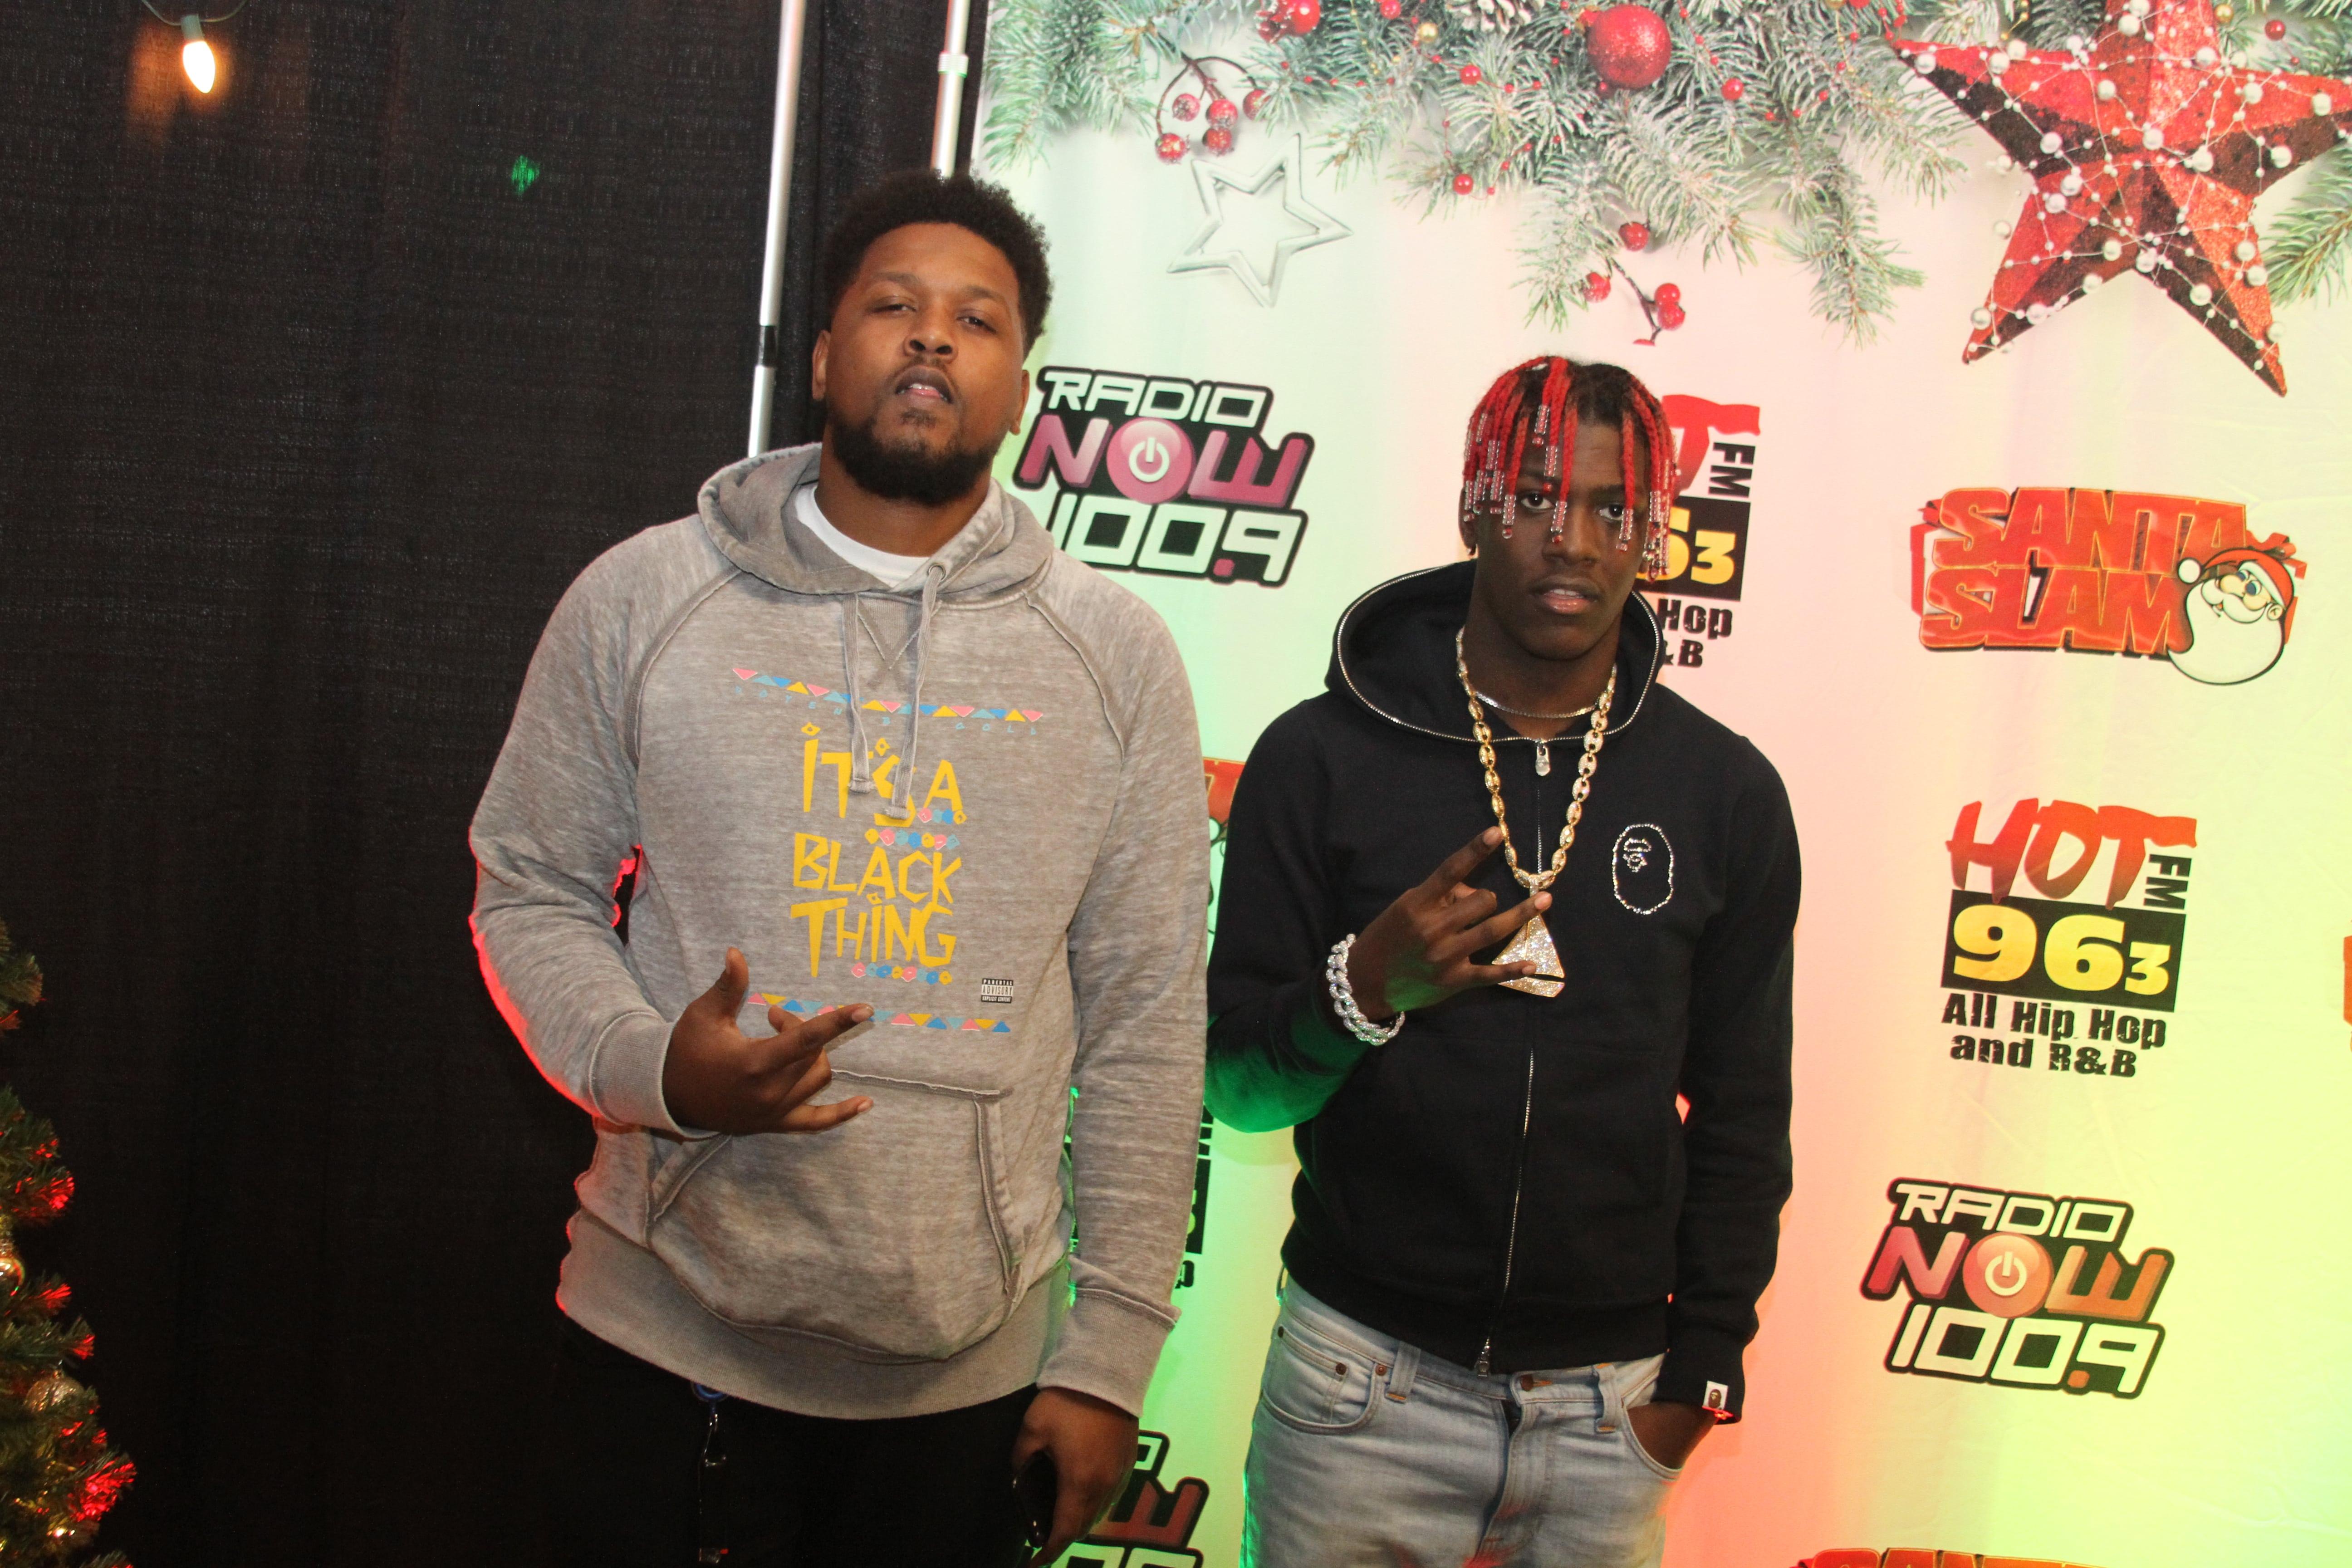 Lil Yachtys Santa Slam Meet And Greet Radionow 1009